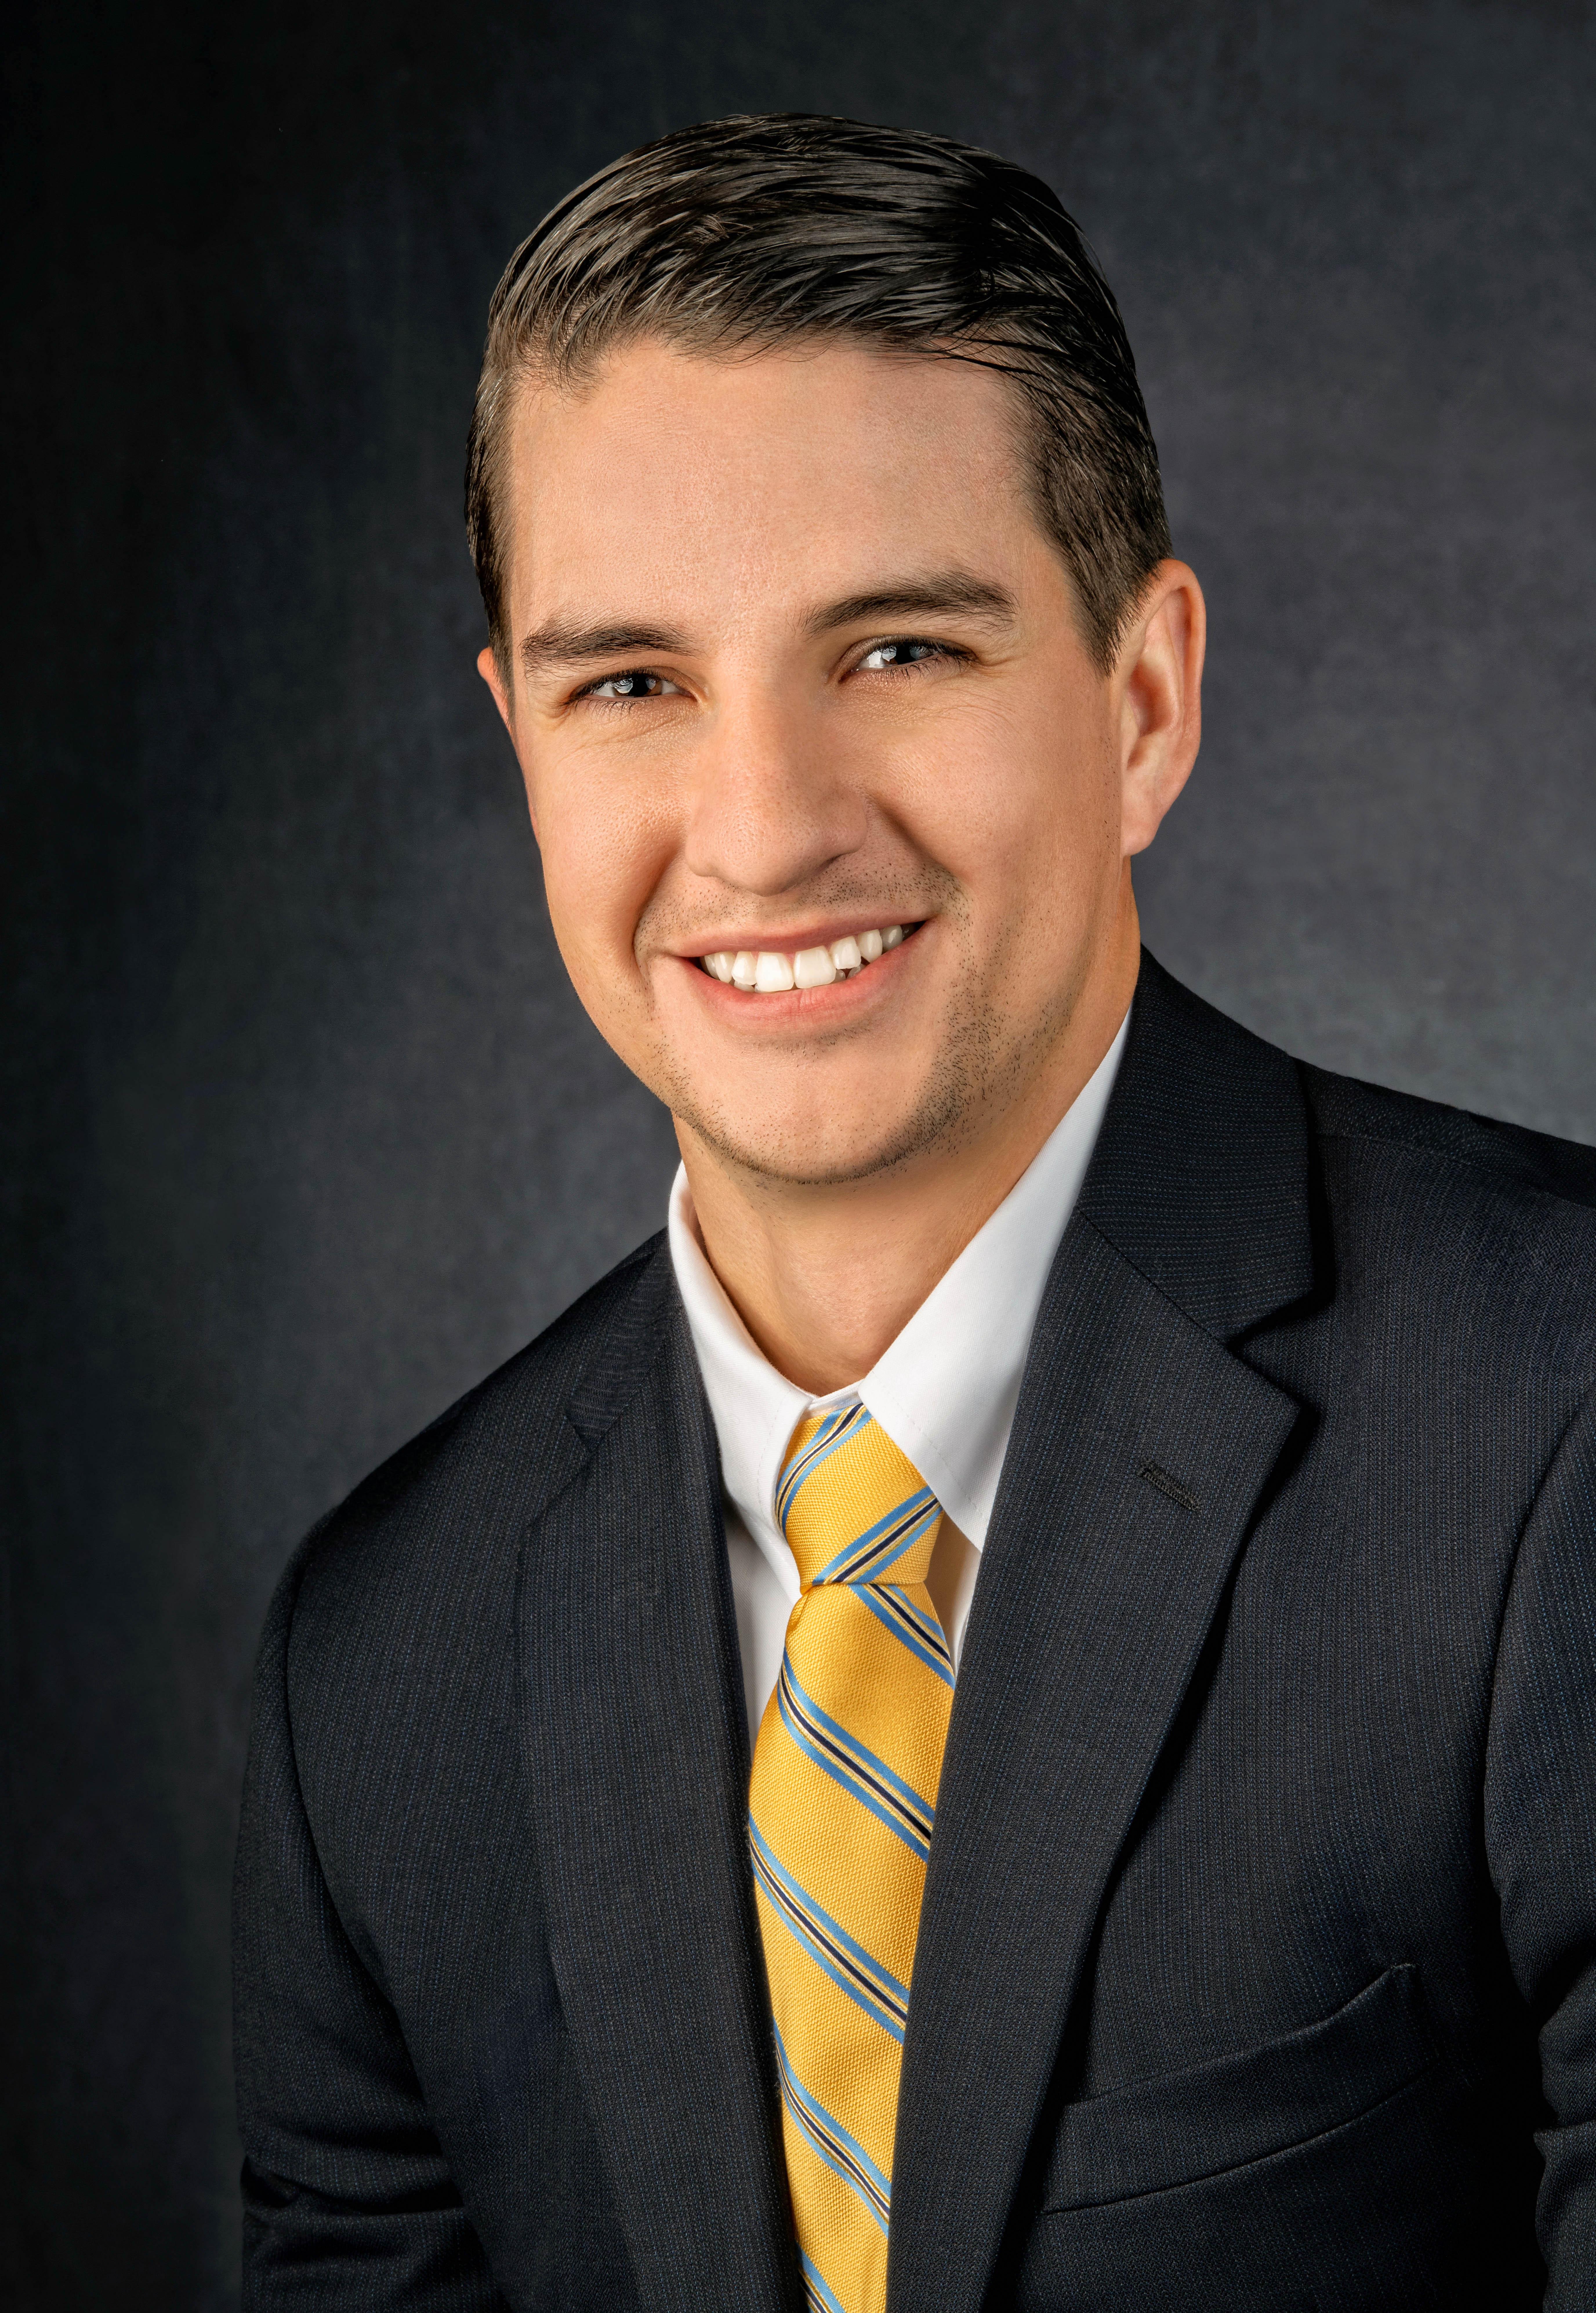 Joel A. Johnson, CFA